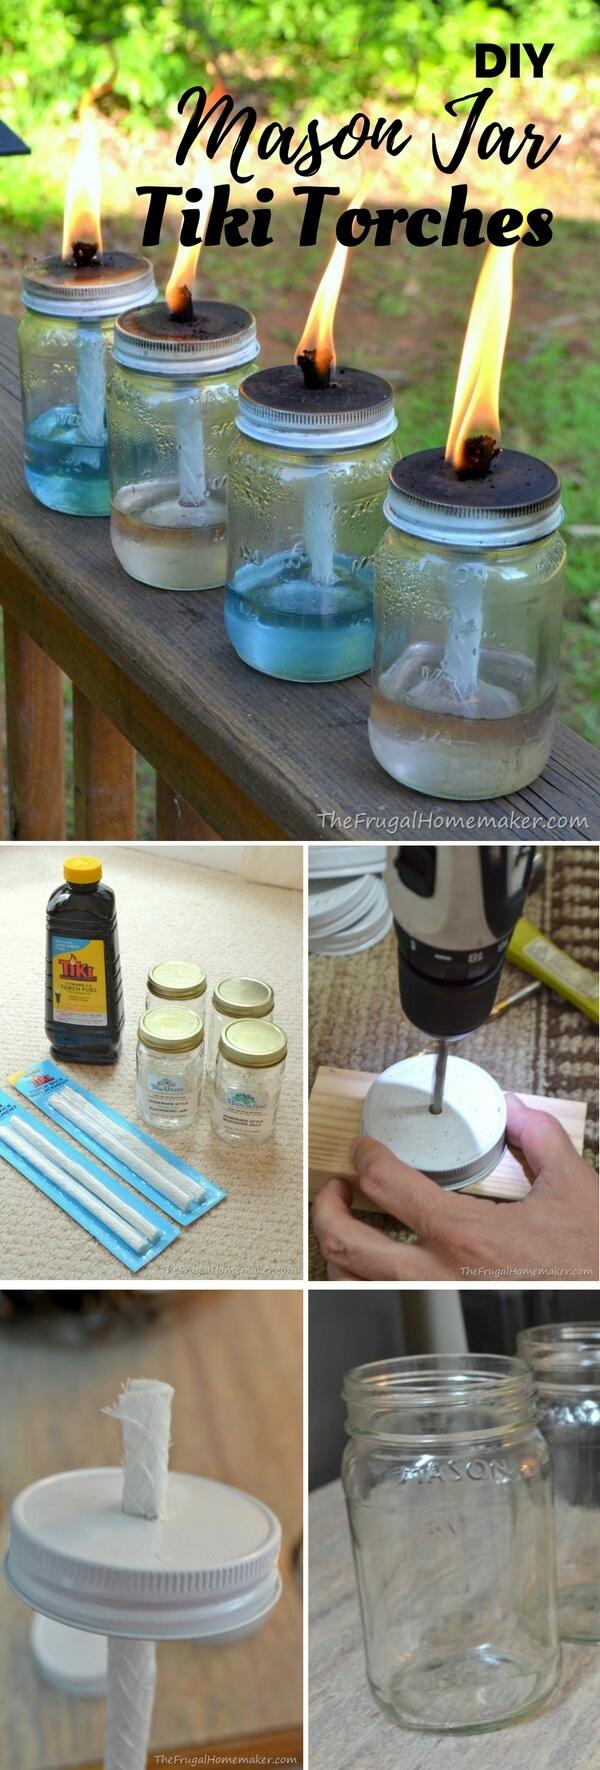 Tiki Fires That Use Mason Jar Designs